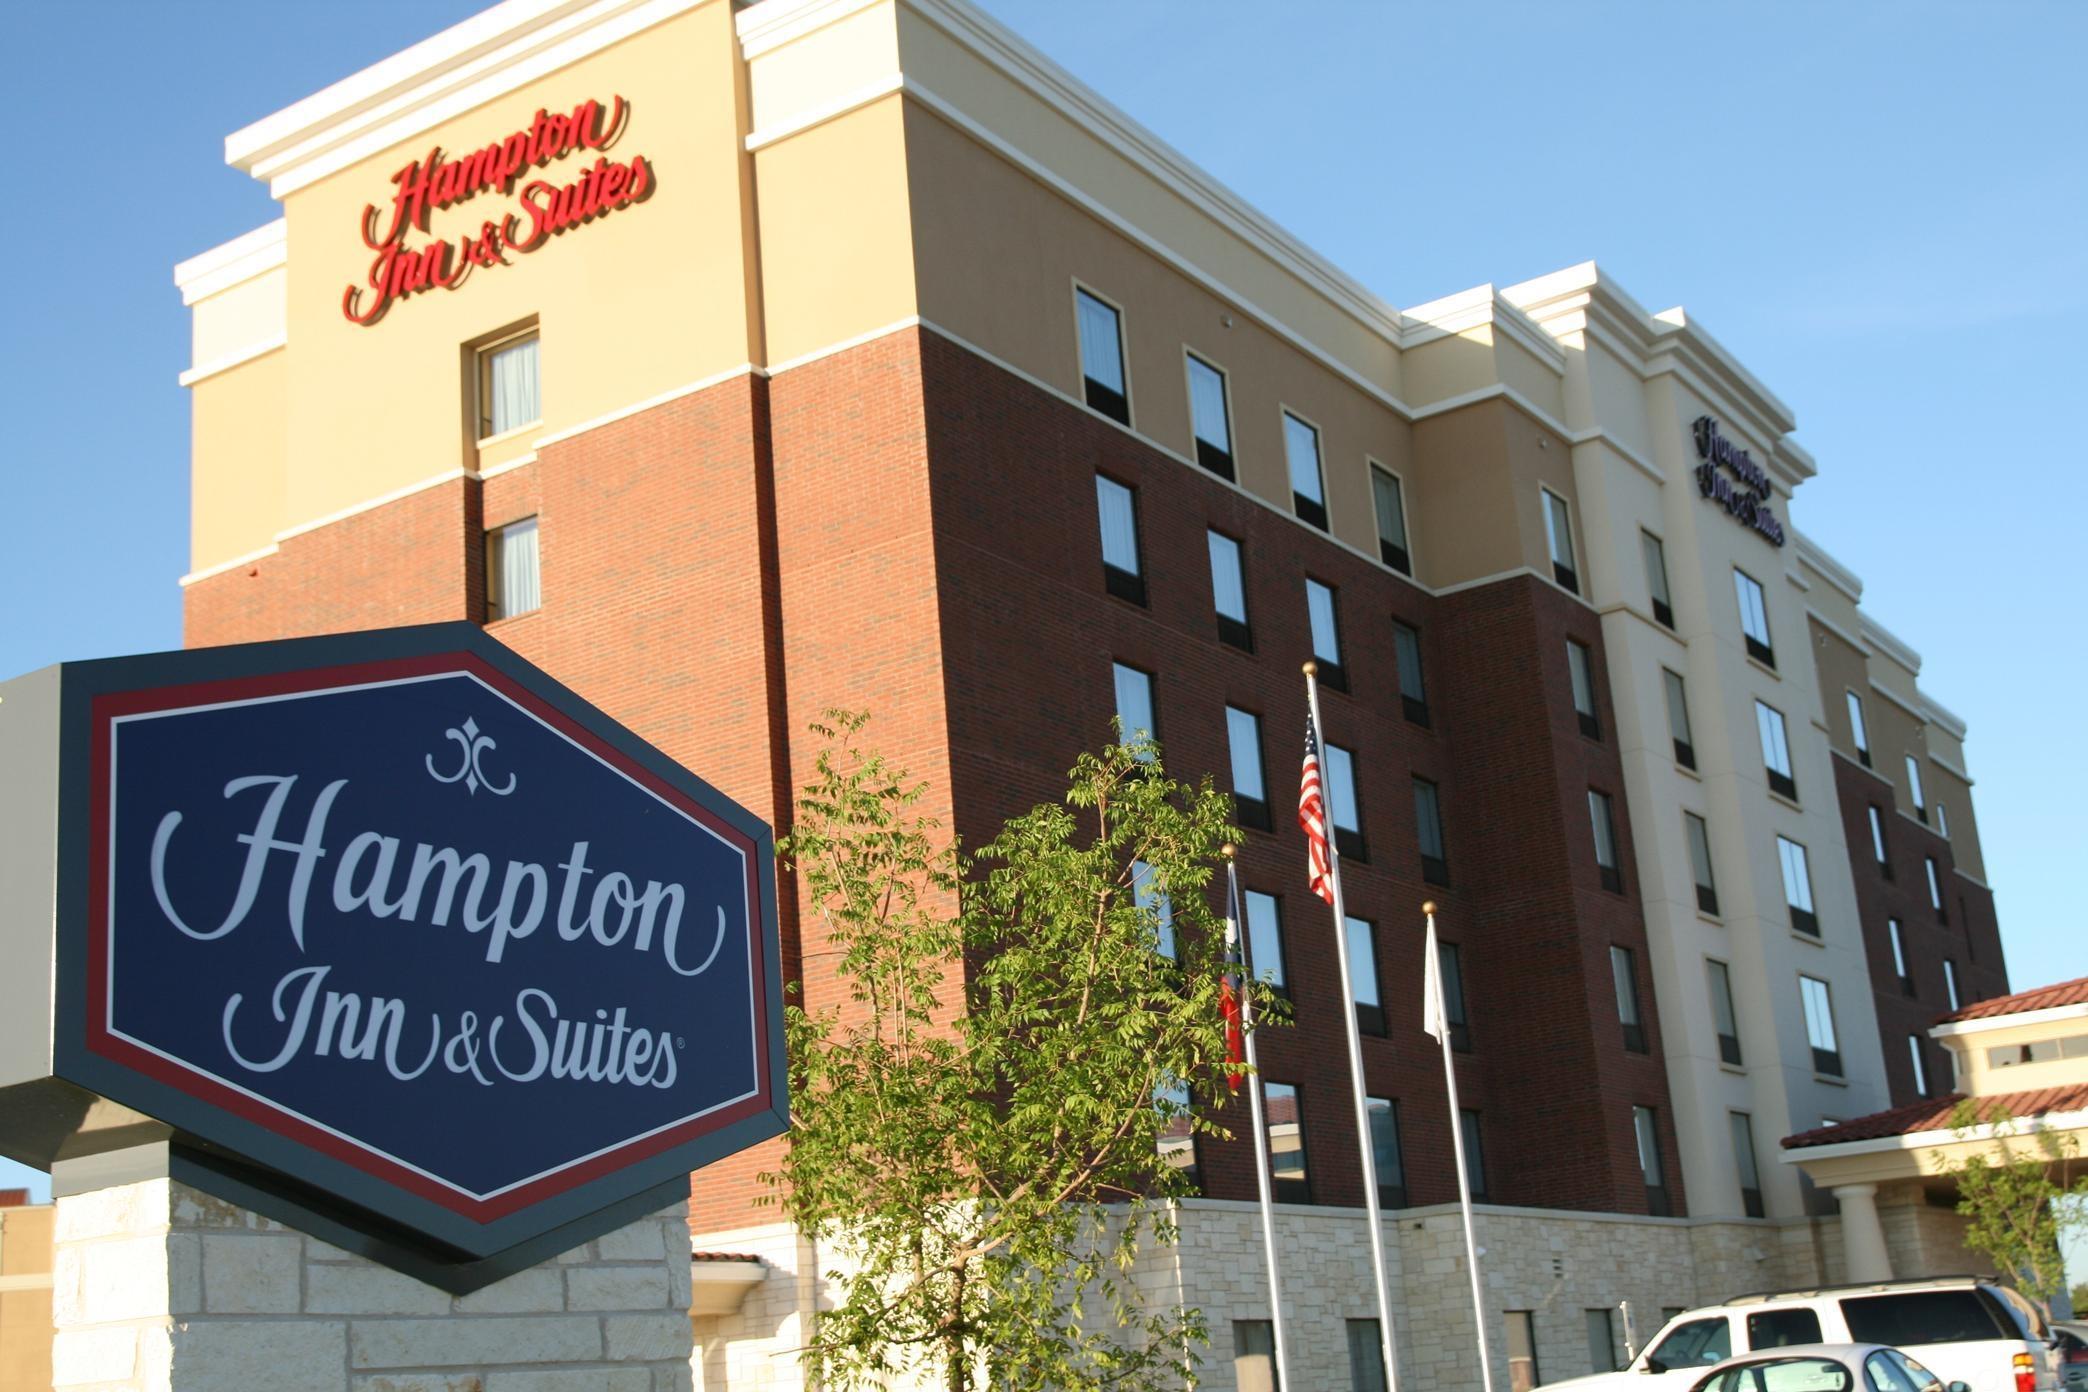 Hampton Inn & Suites Dallas/Lewisville-Vista Ridge Mall, TX image 0